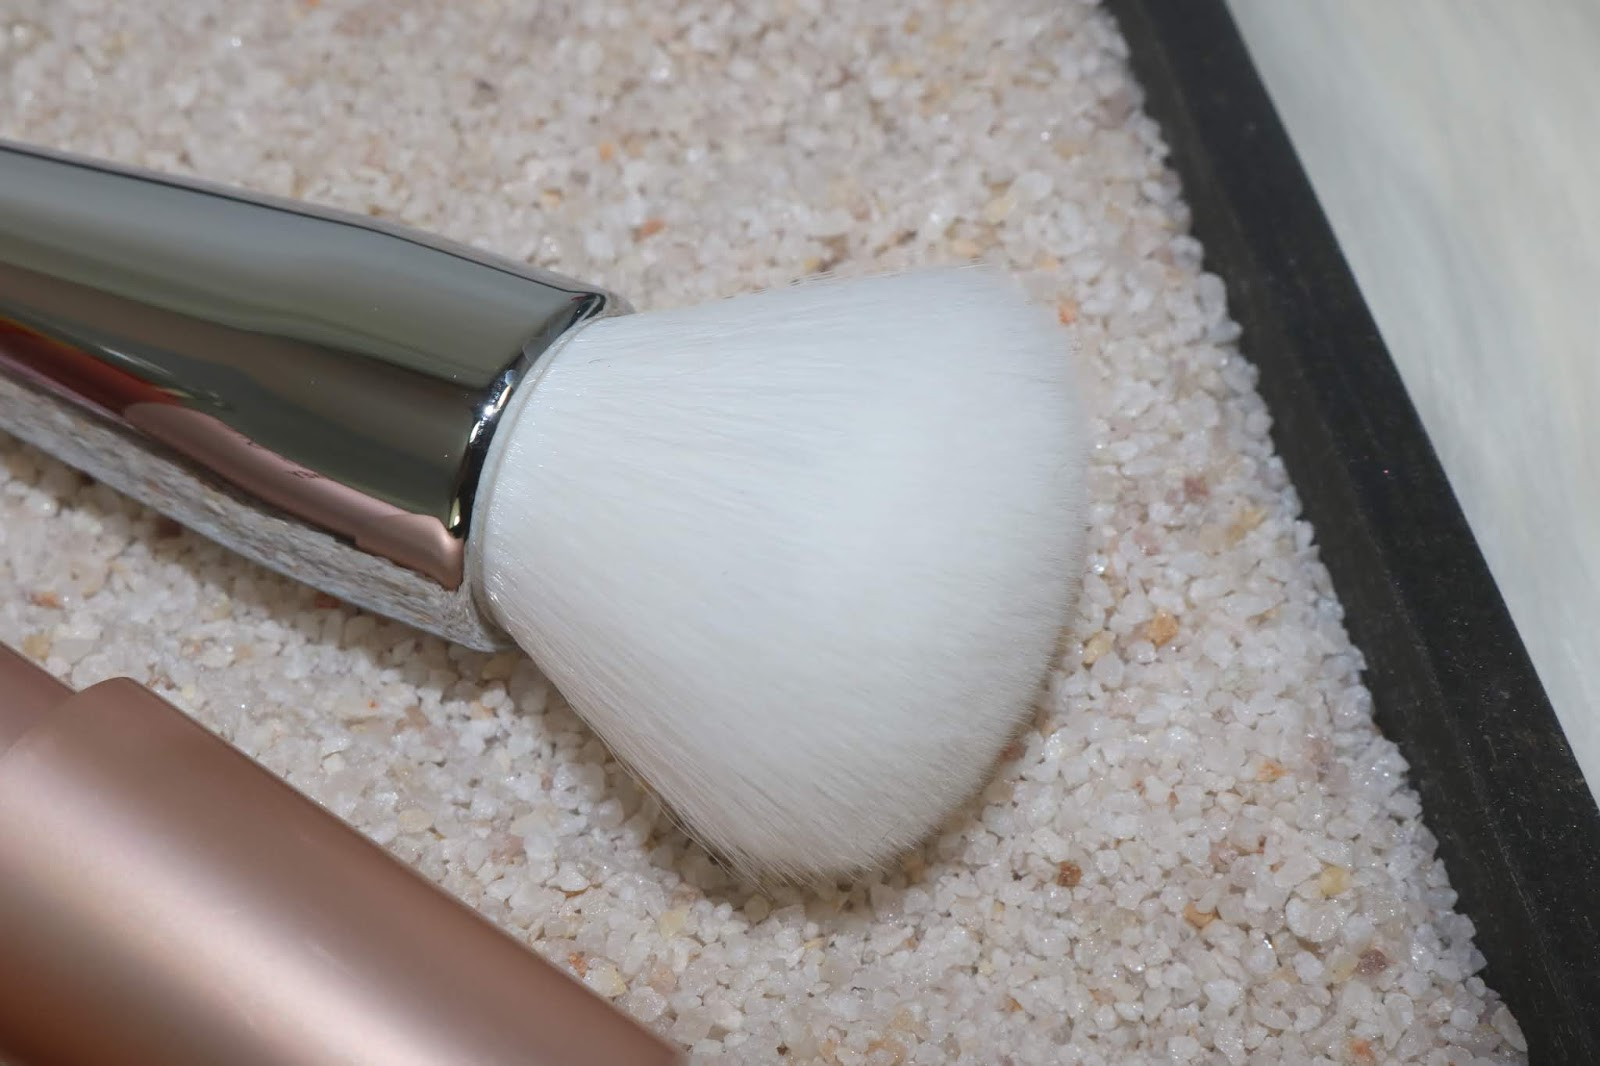 IT Cosmetics Heavenly Skin CC+ Skin-Perfecting Brush